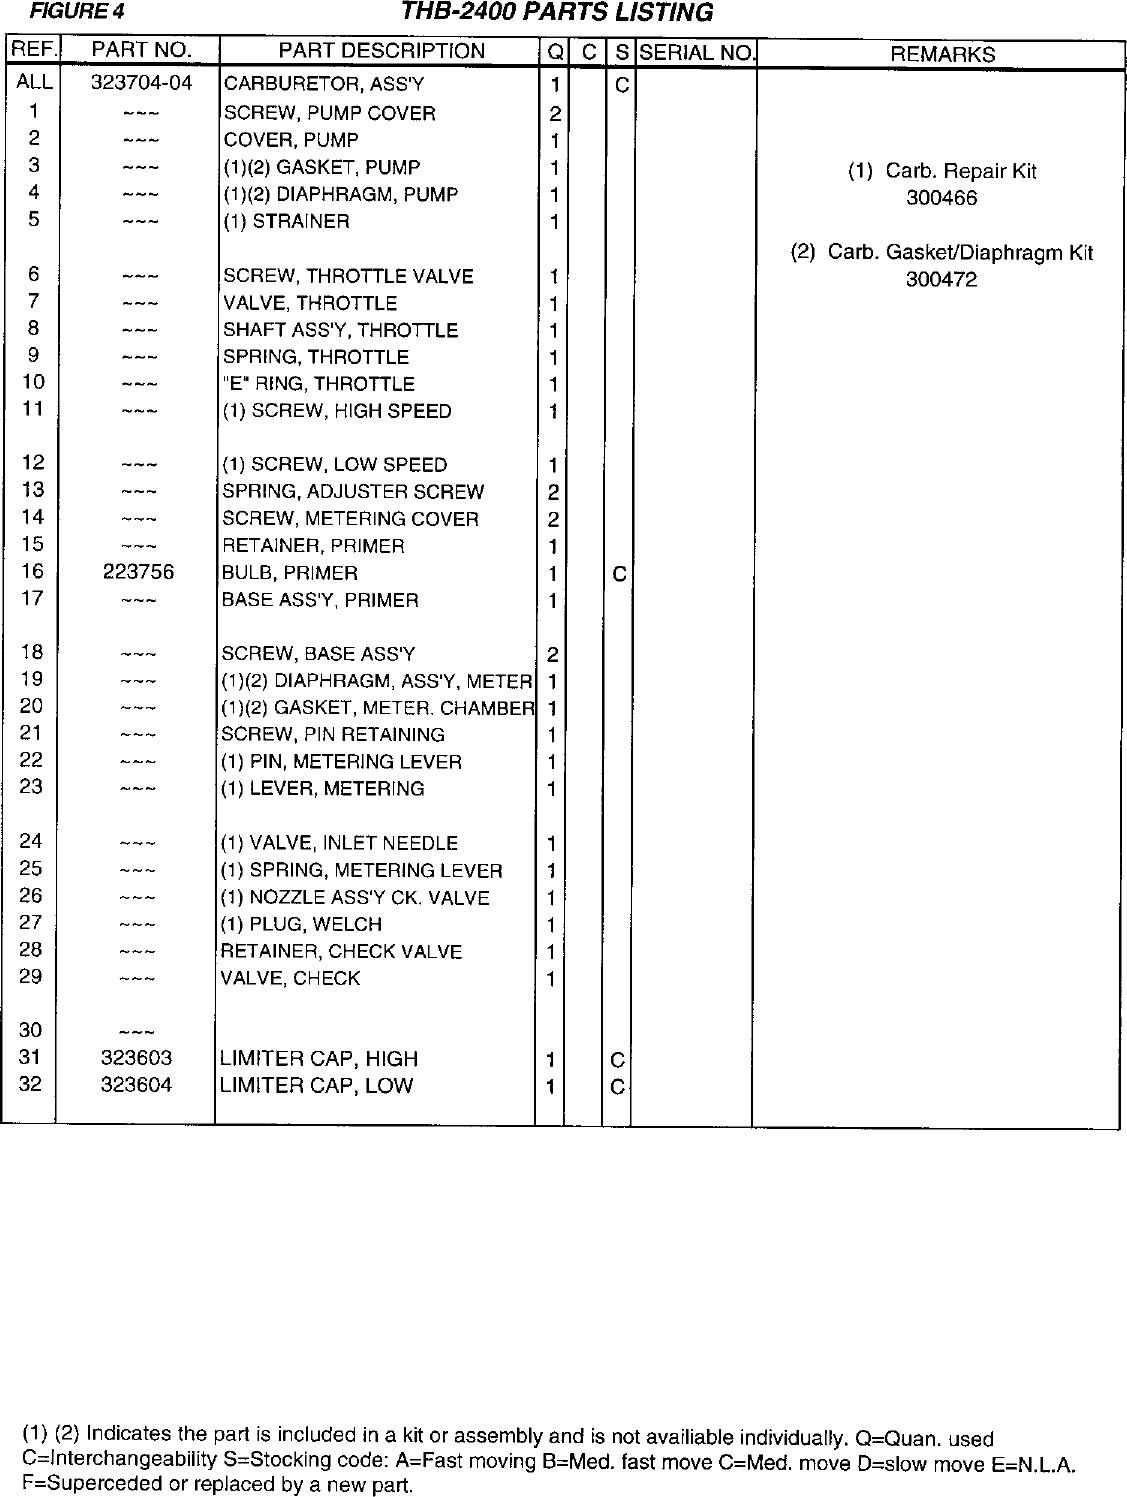 Tanaka Thb 2400 Users Manual